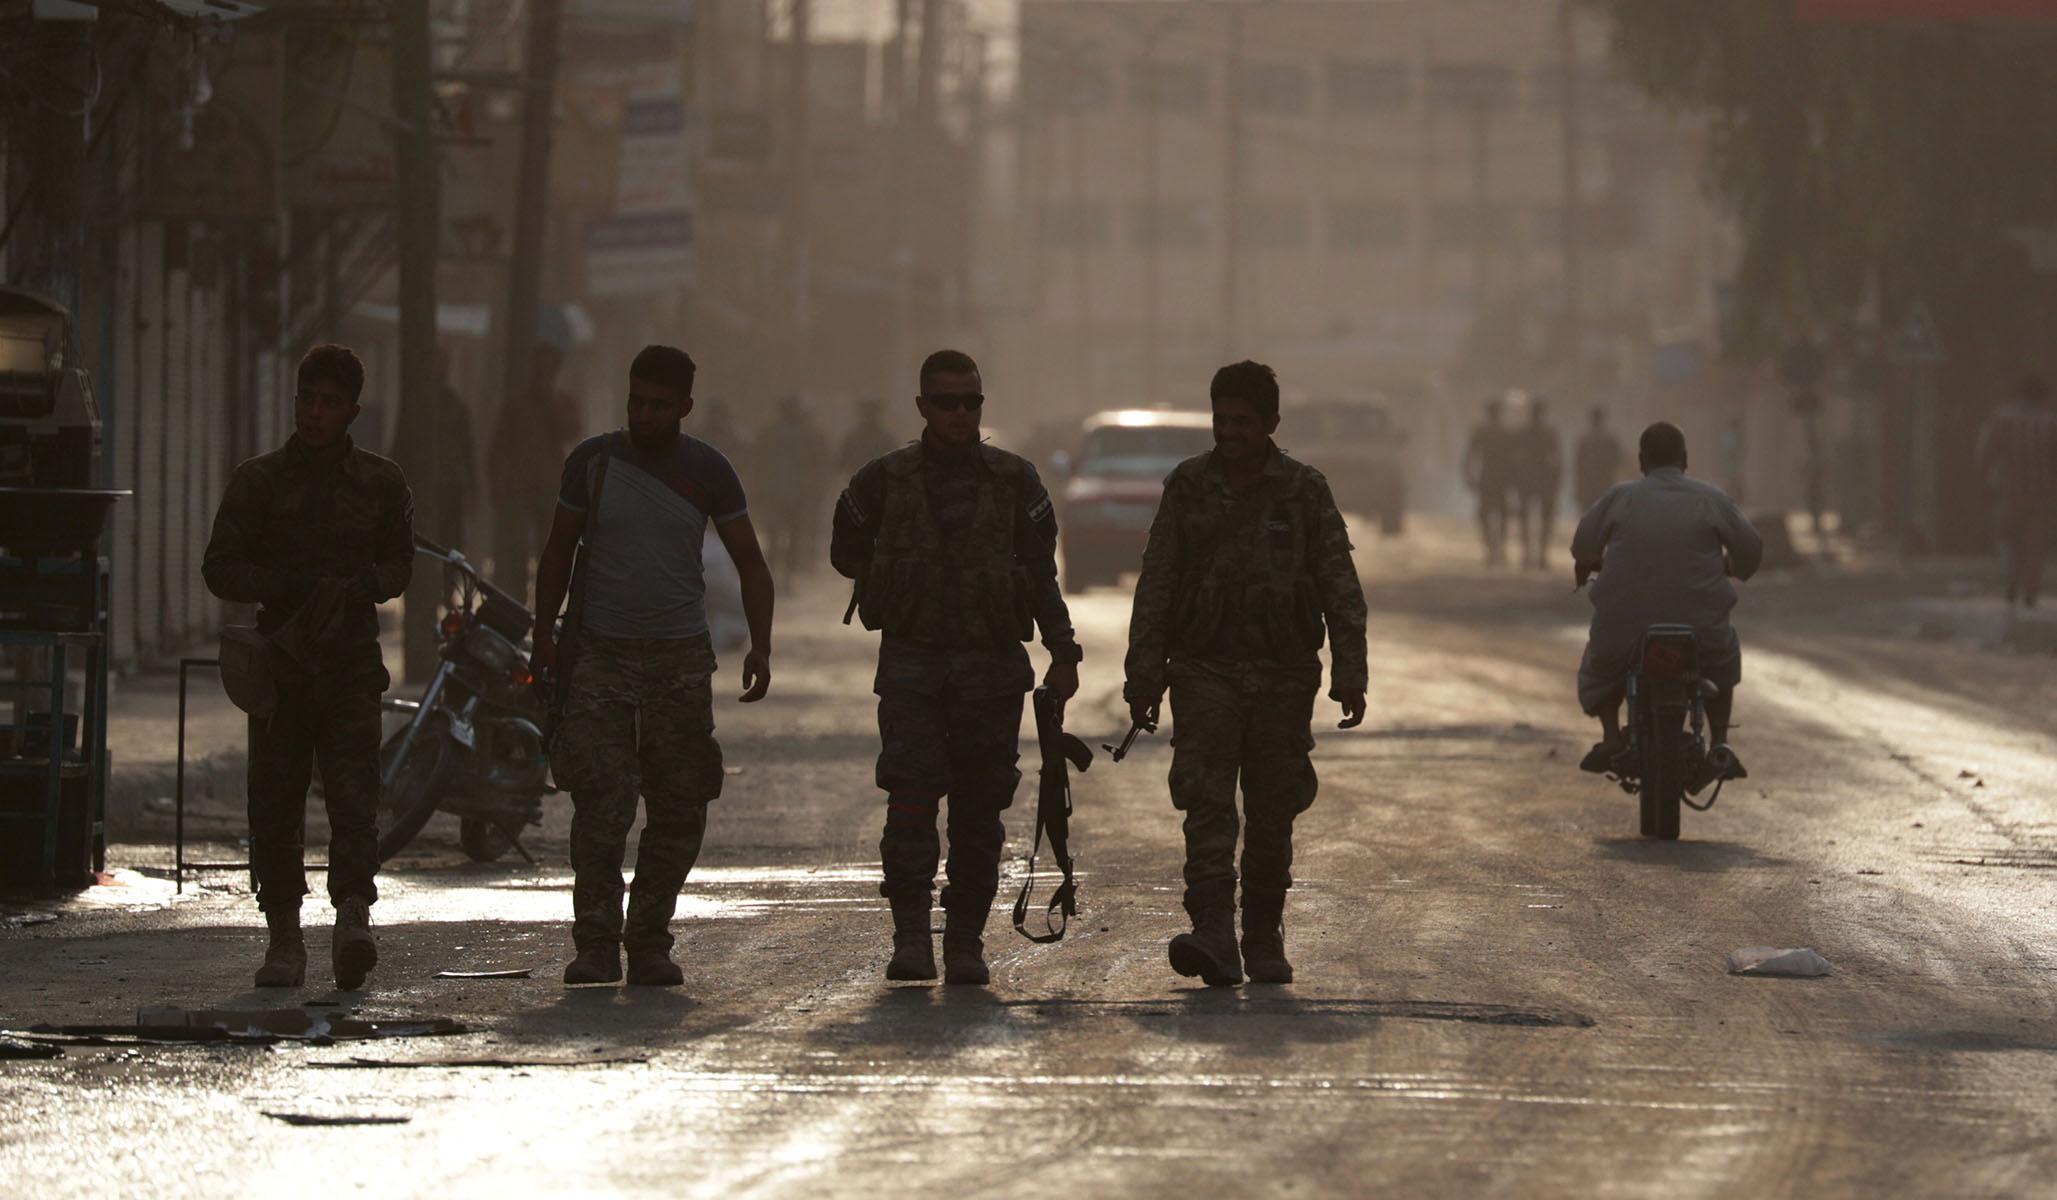 U.S., Turkey Reach Ceasefire Agreement in Syria Conflict